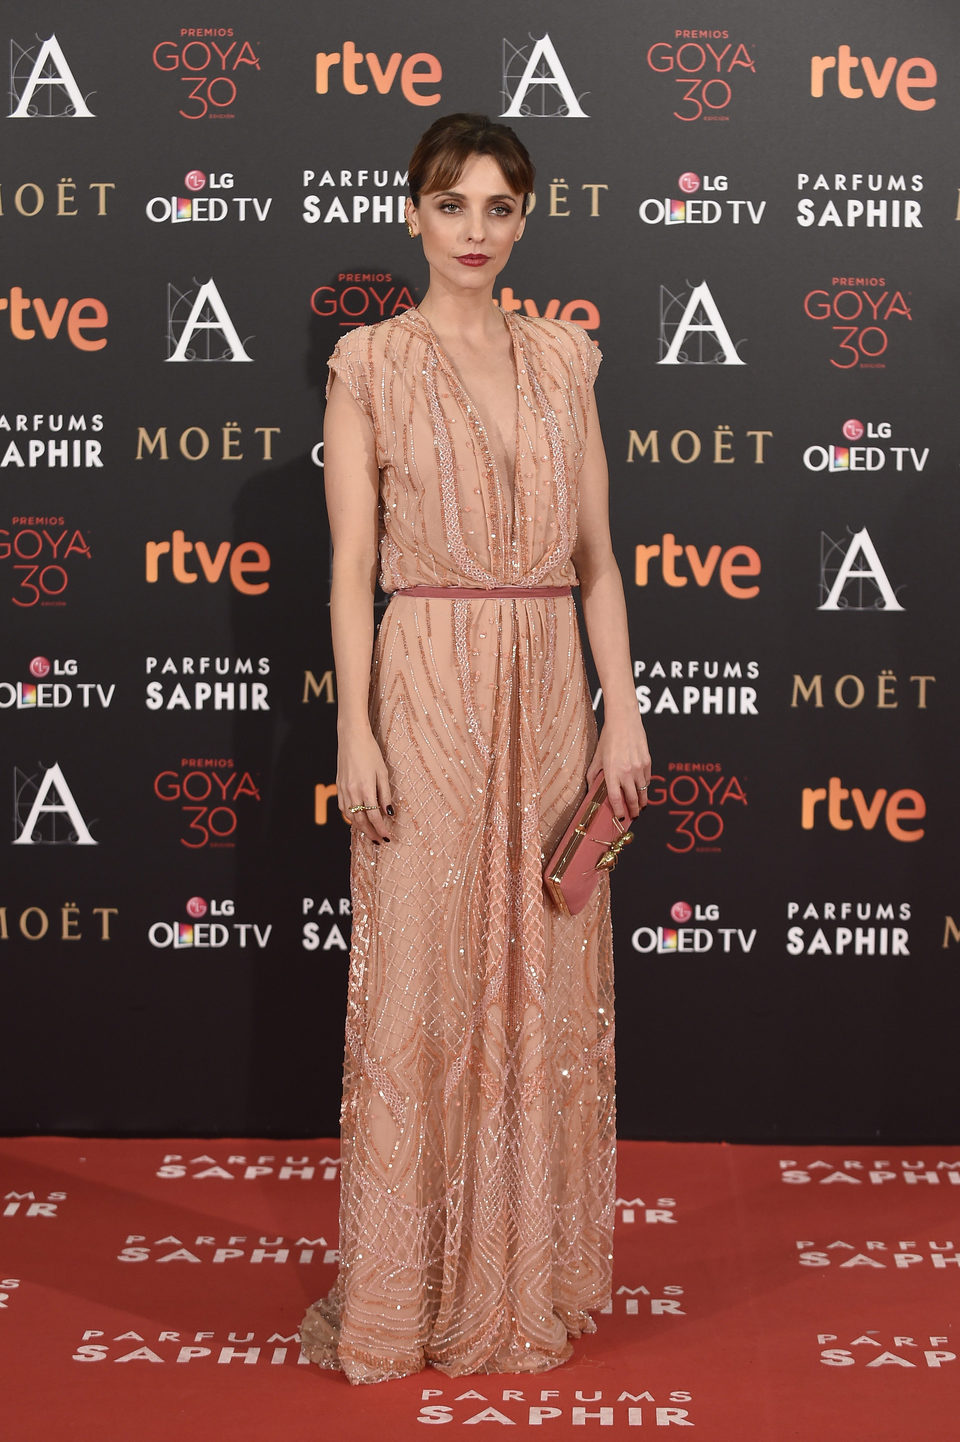 leticia dolera alfombra roja gala goya 2016